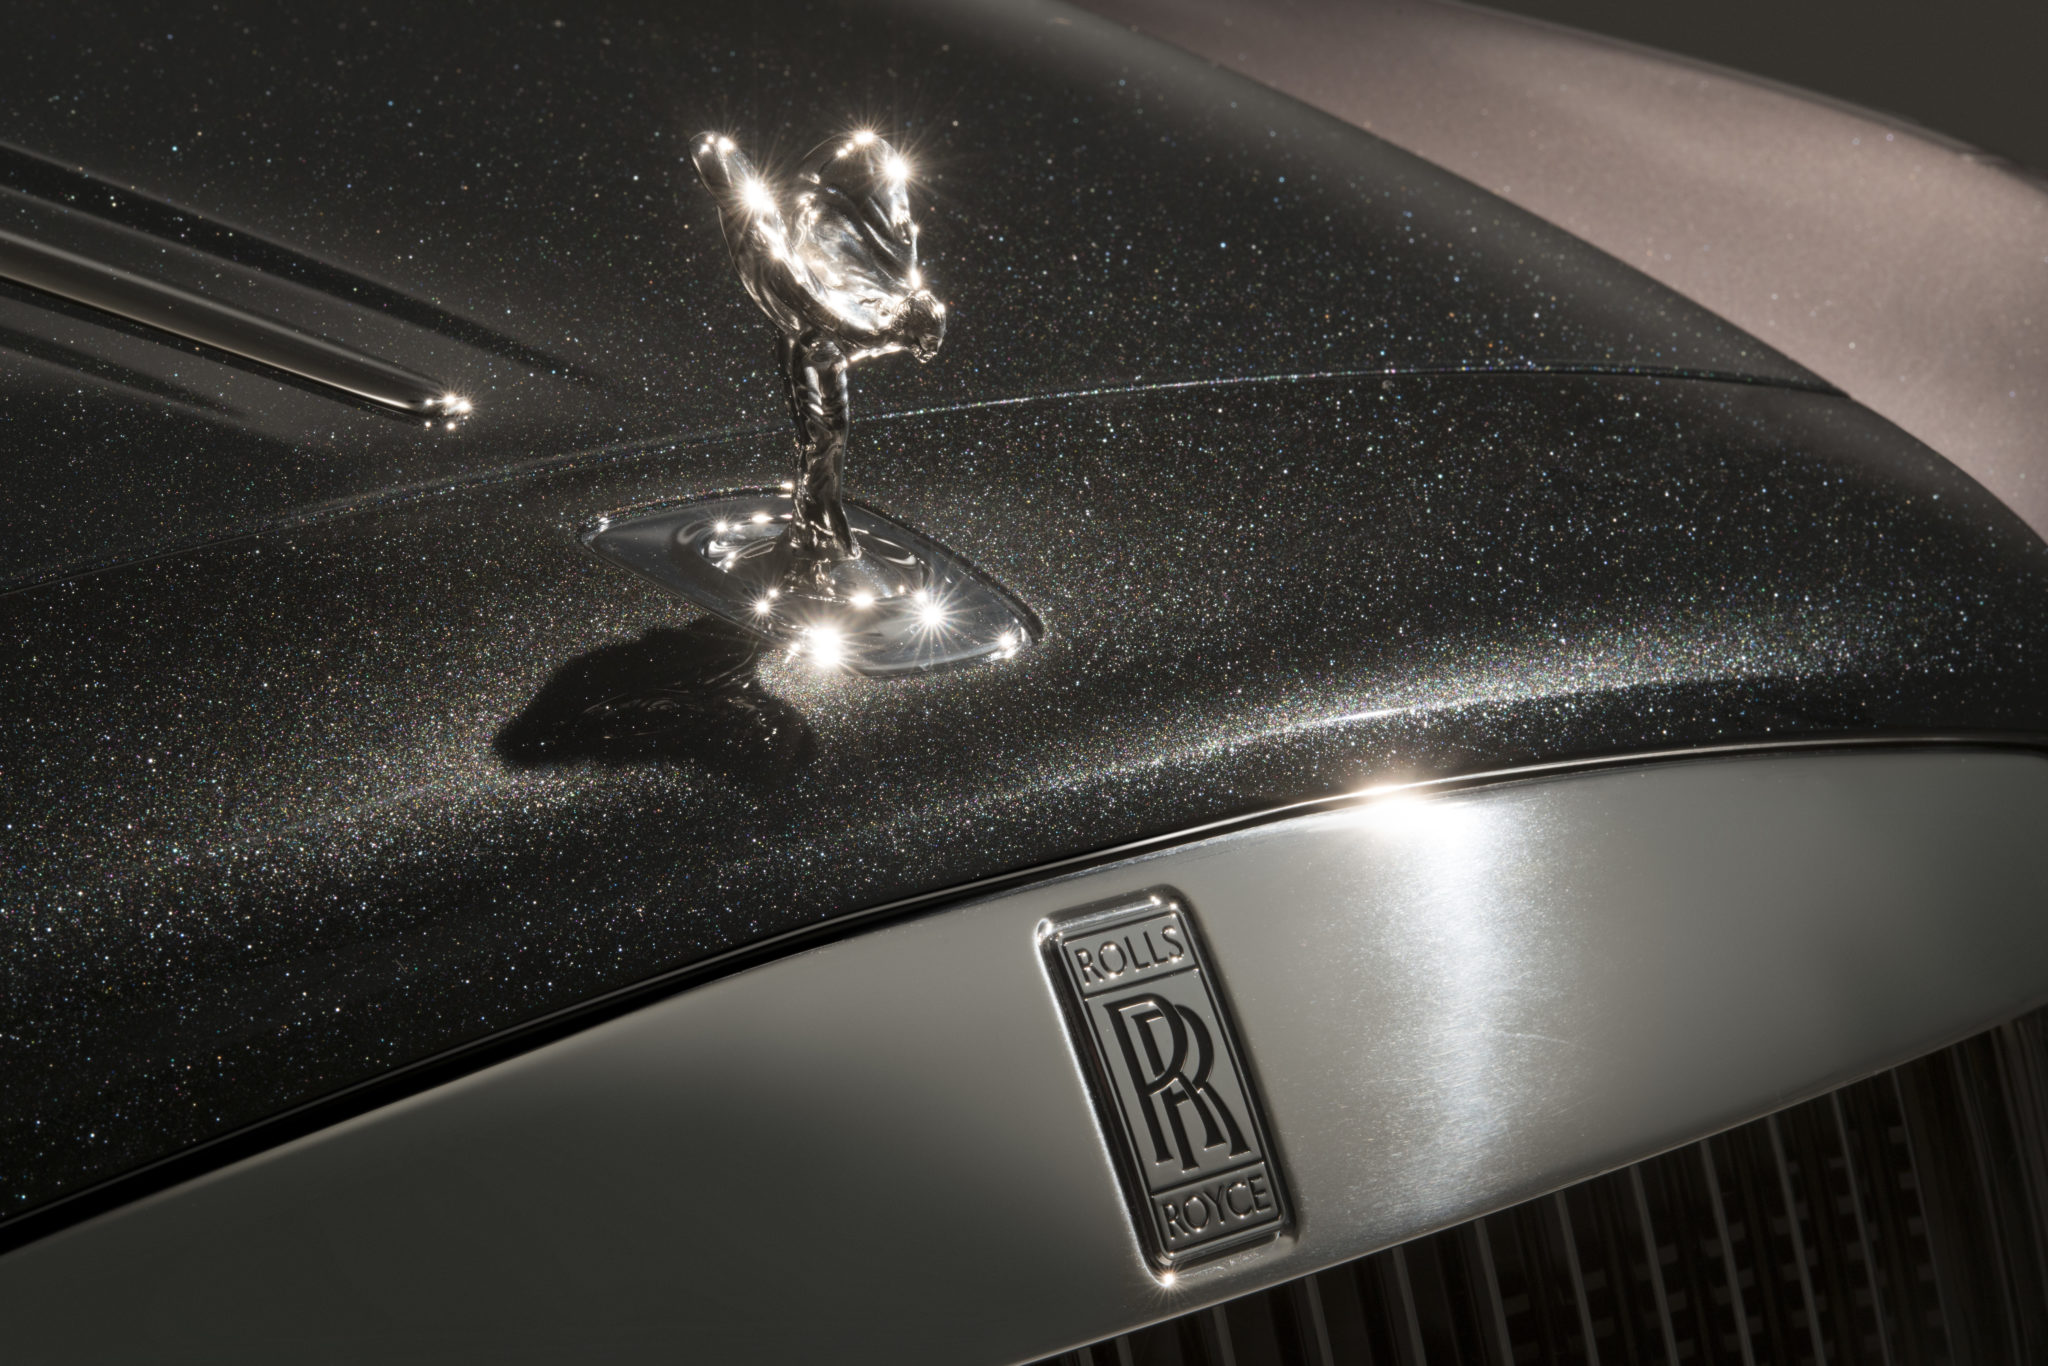 rolls-royce wraith black badge 2017 geneve autosalon concept